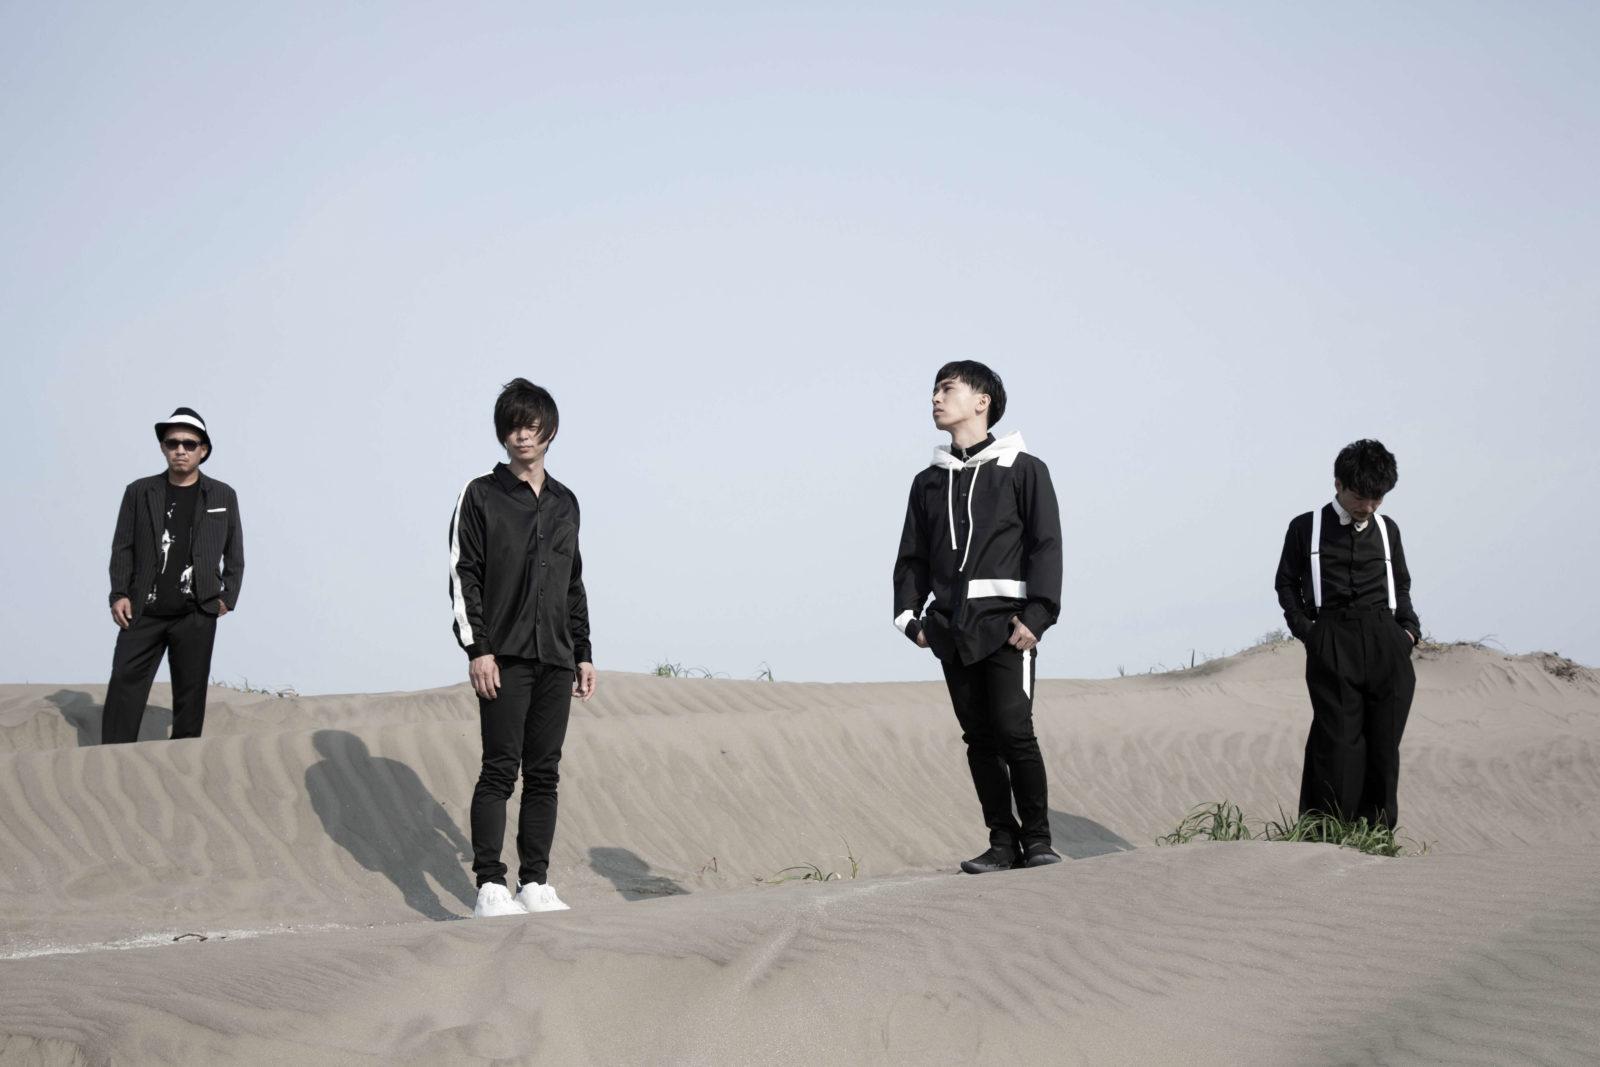 UNCHAIN、新曲が須賀健太主演ドラマの主題歌に決定サムネイル画像